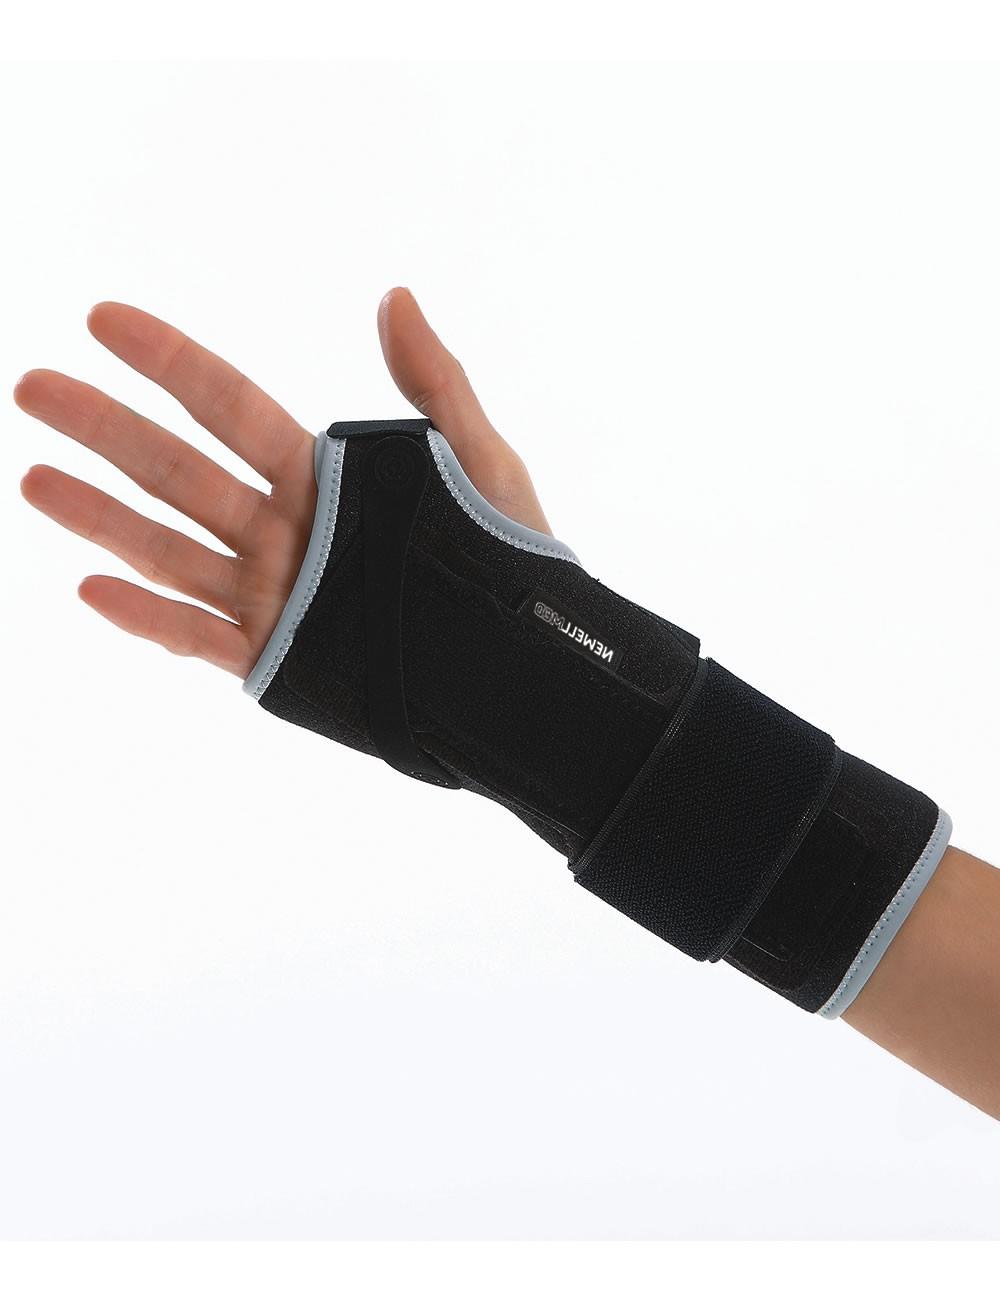 PK06 - Immobilizing volar wrist brace